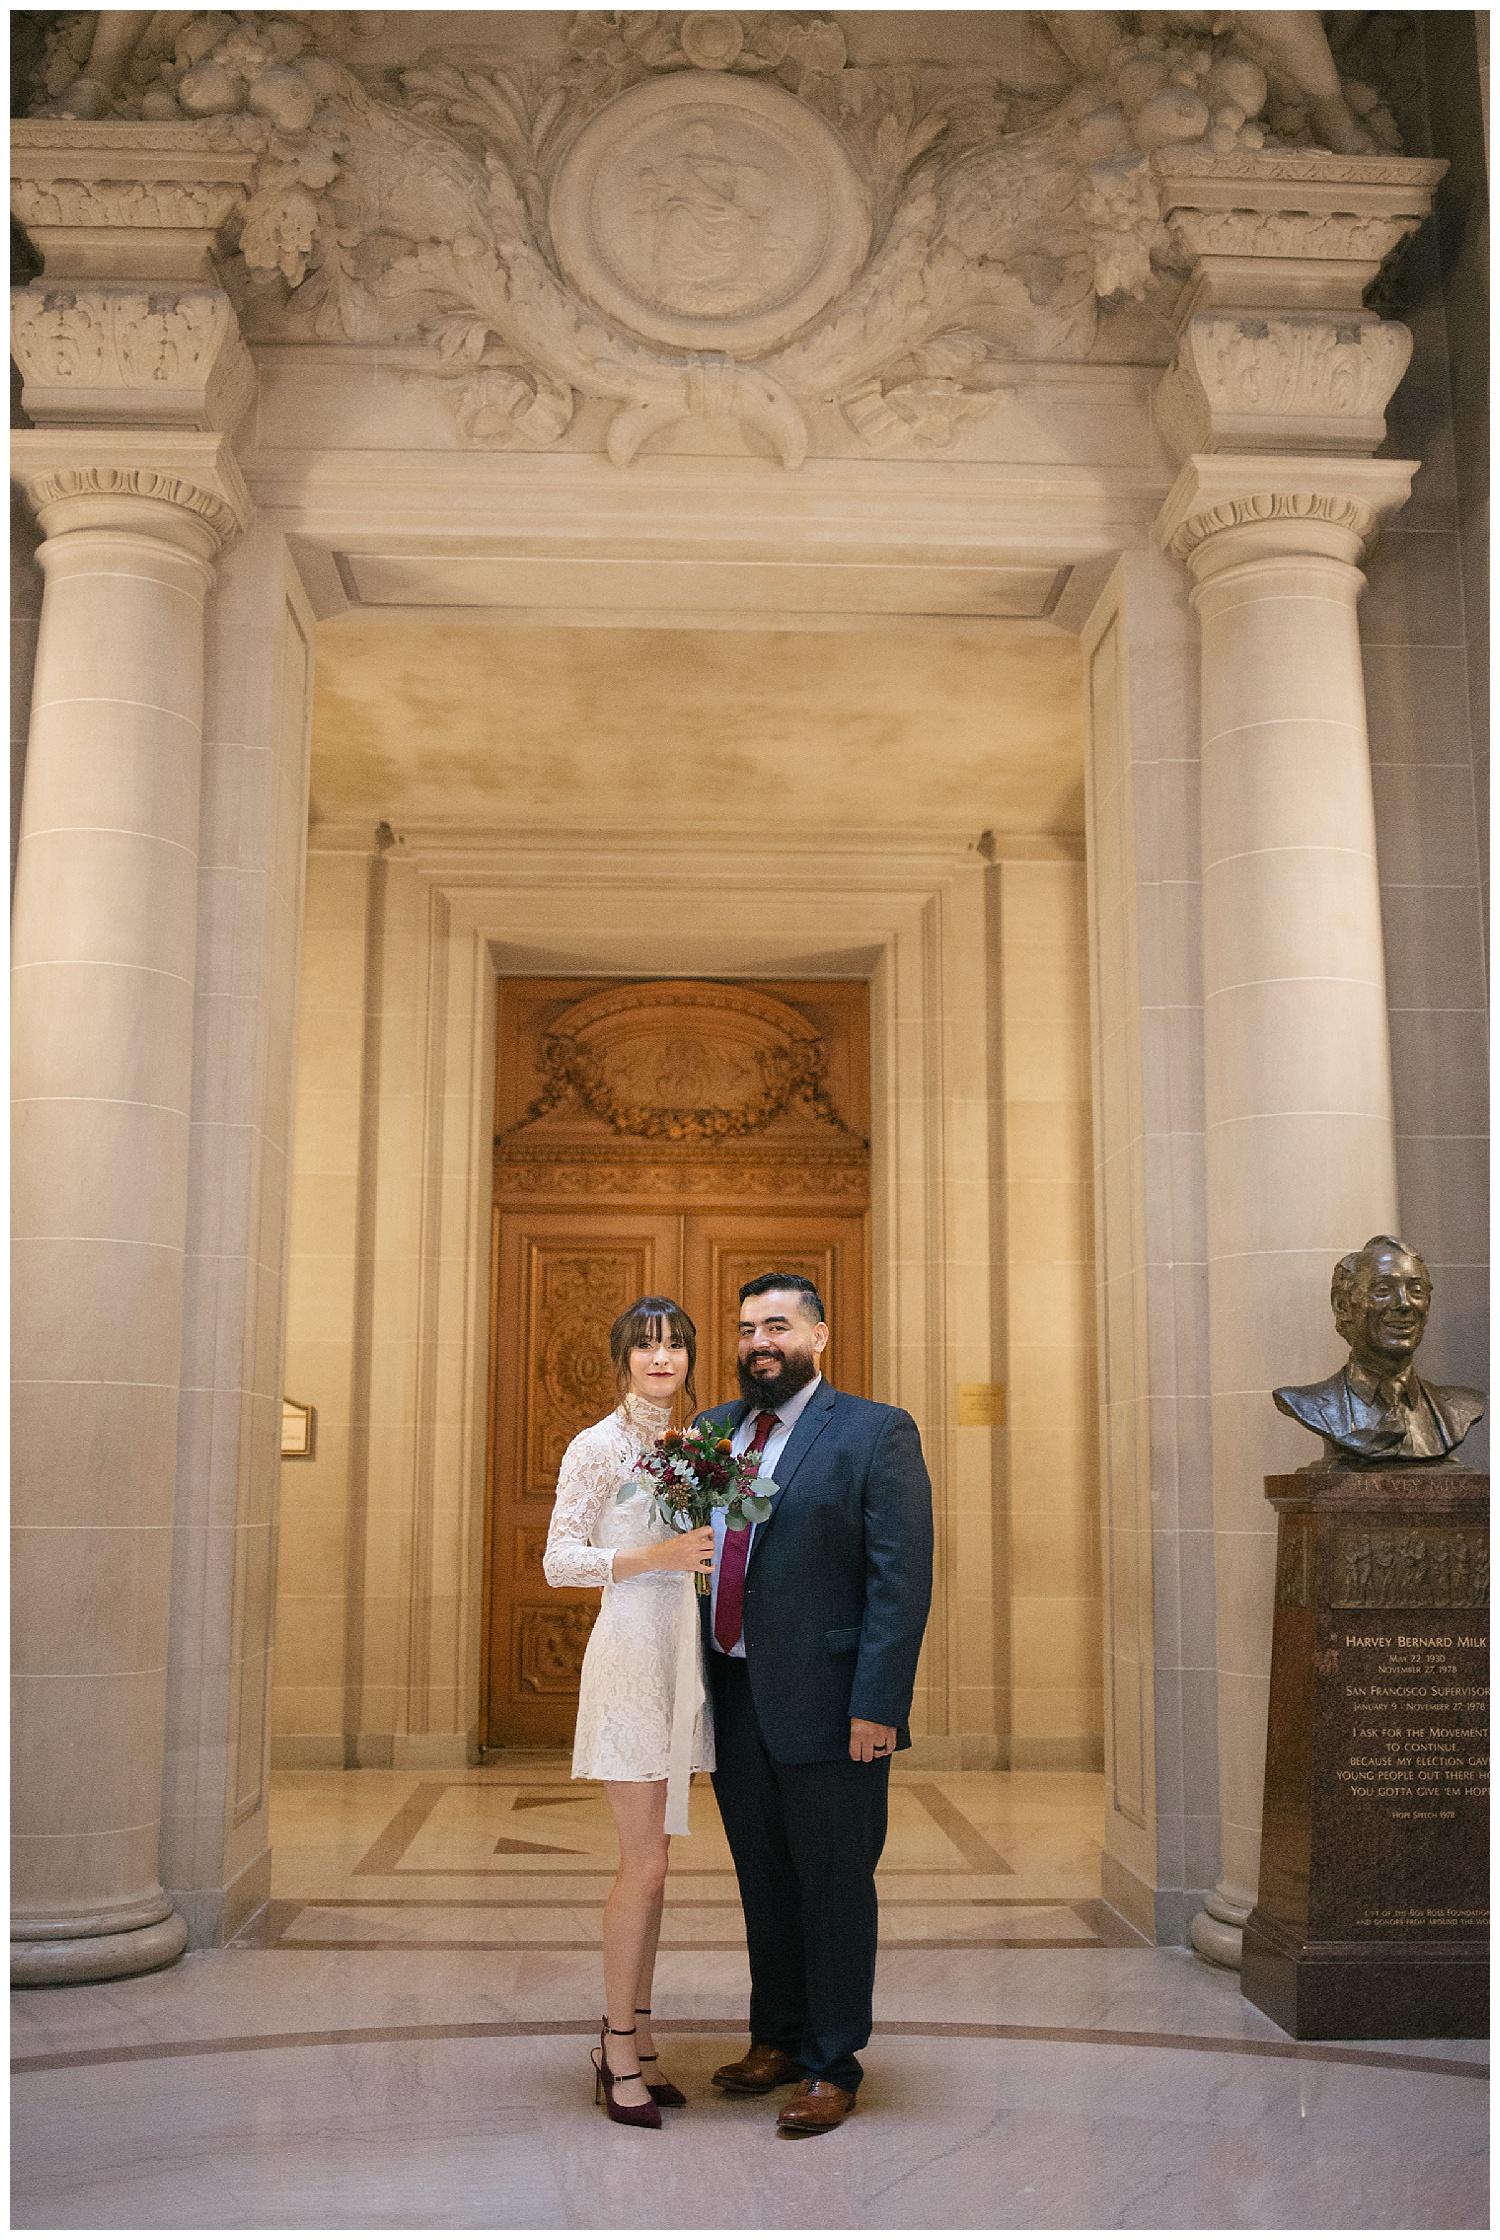 khariza-rae-photography-bay-area-wedding-photographer_0054.jpg